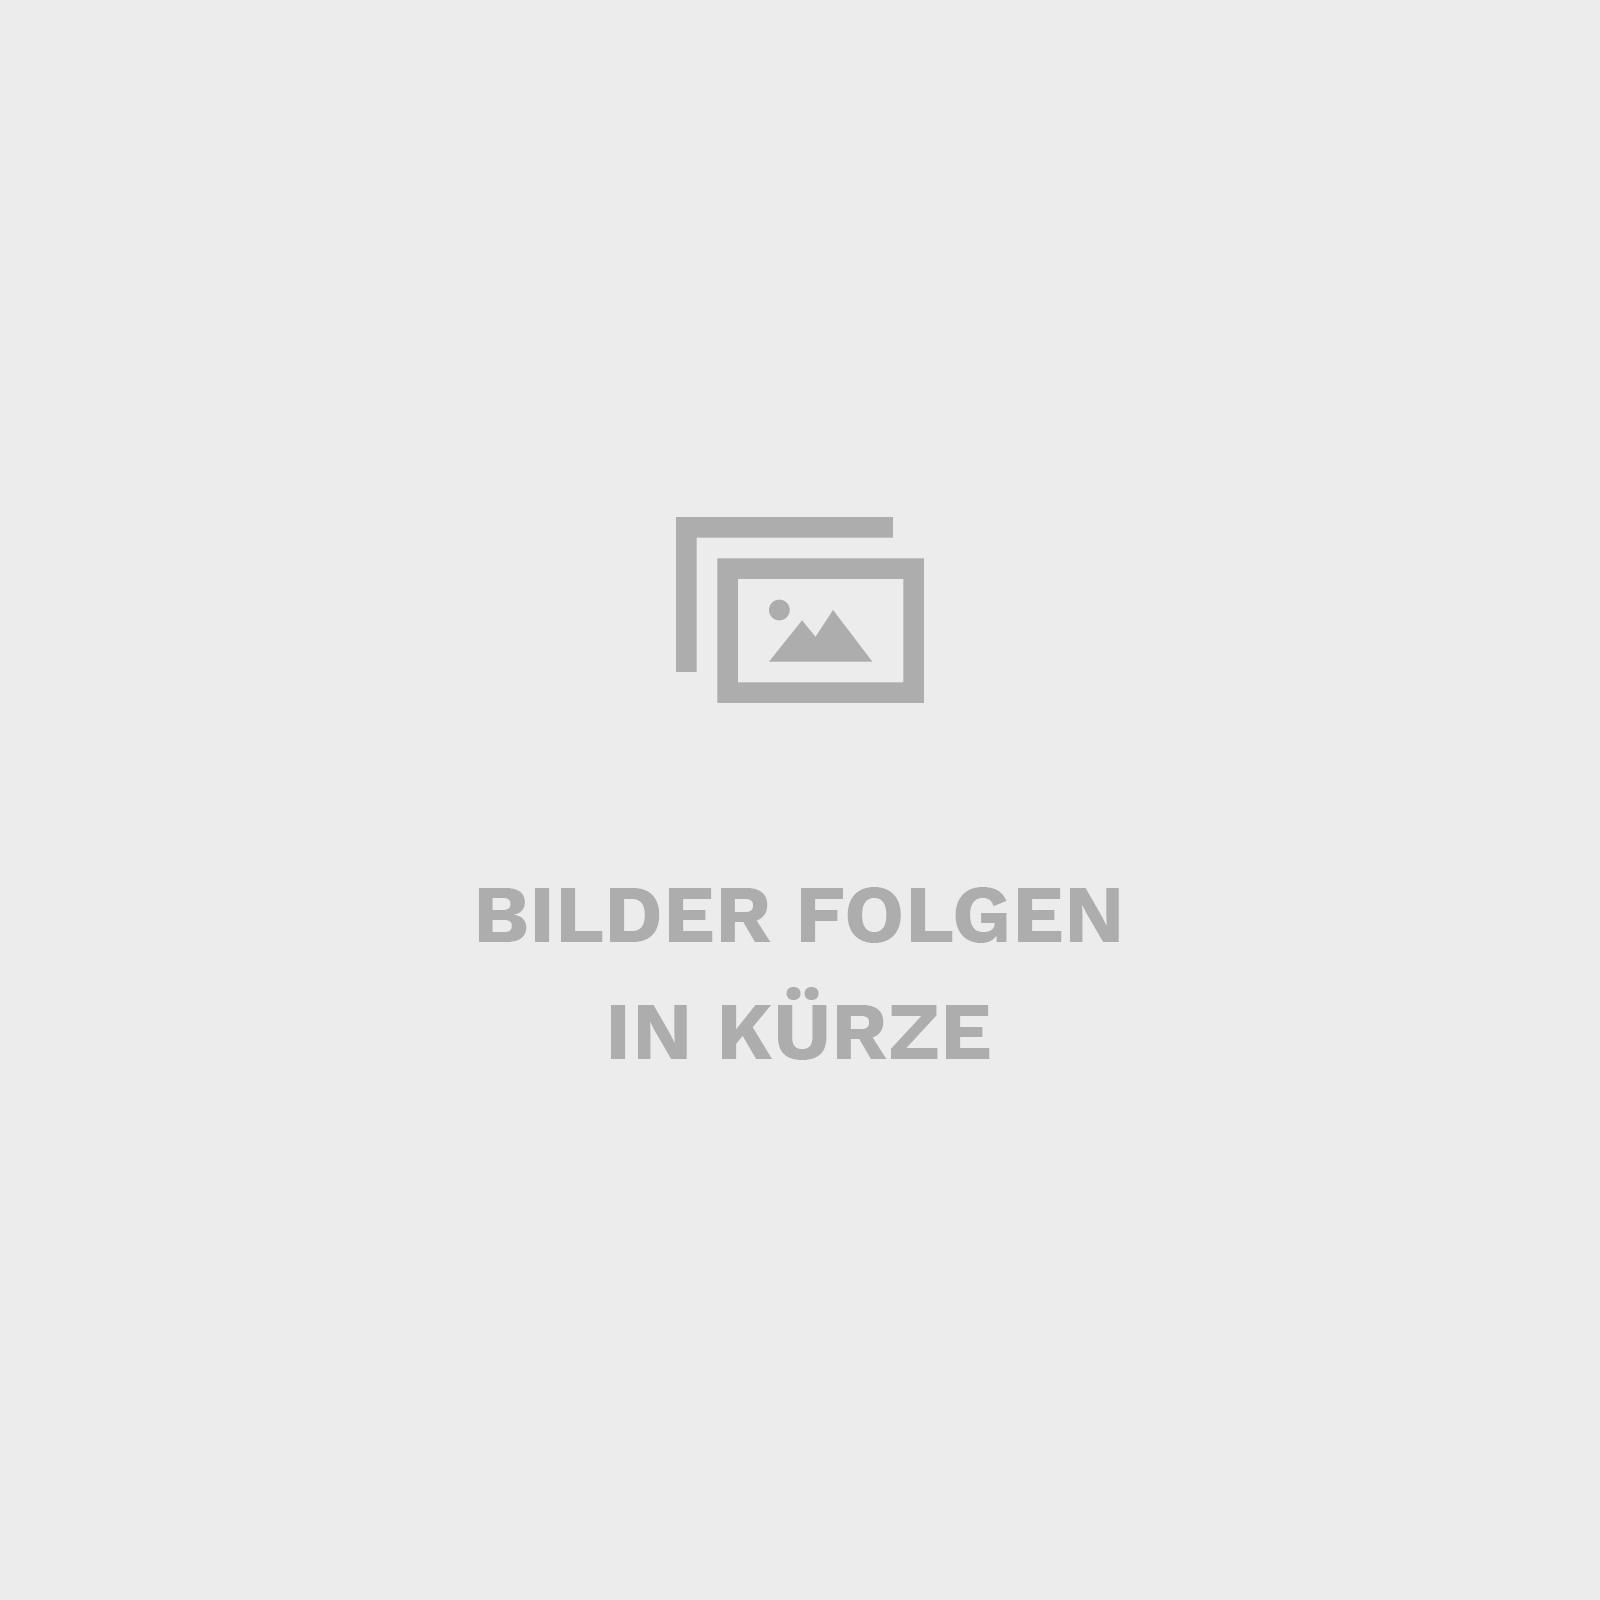 Kvadrat Rugs - Duotone - Farbe 0651 - Detailansicht